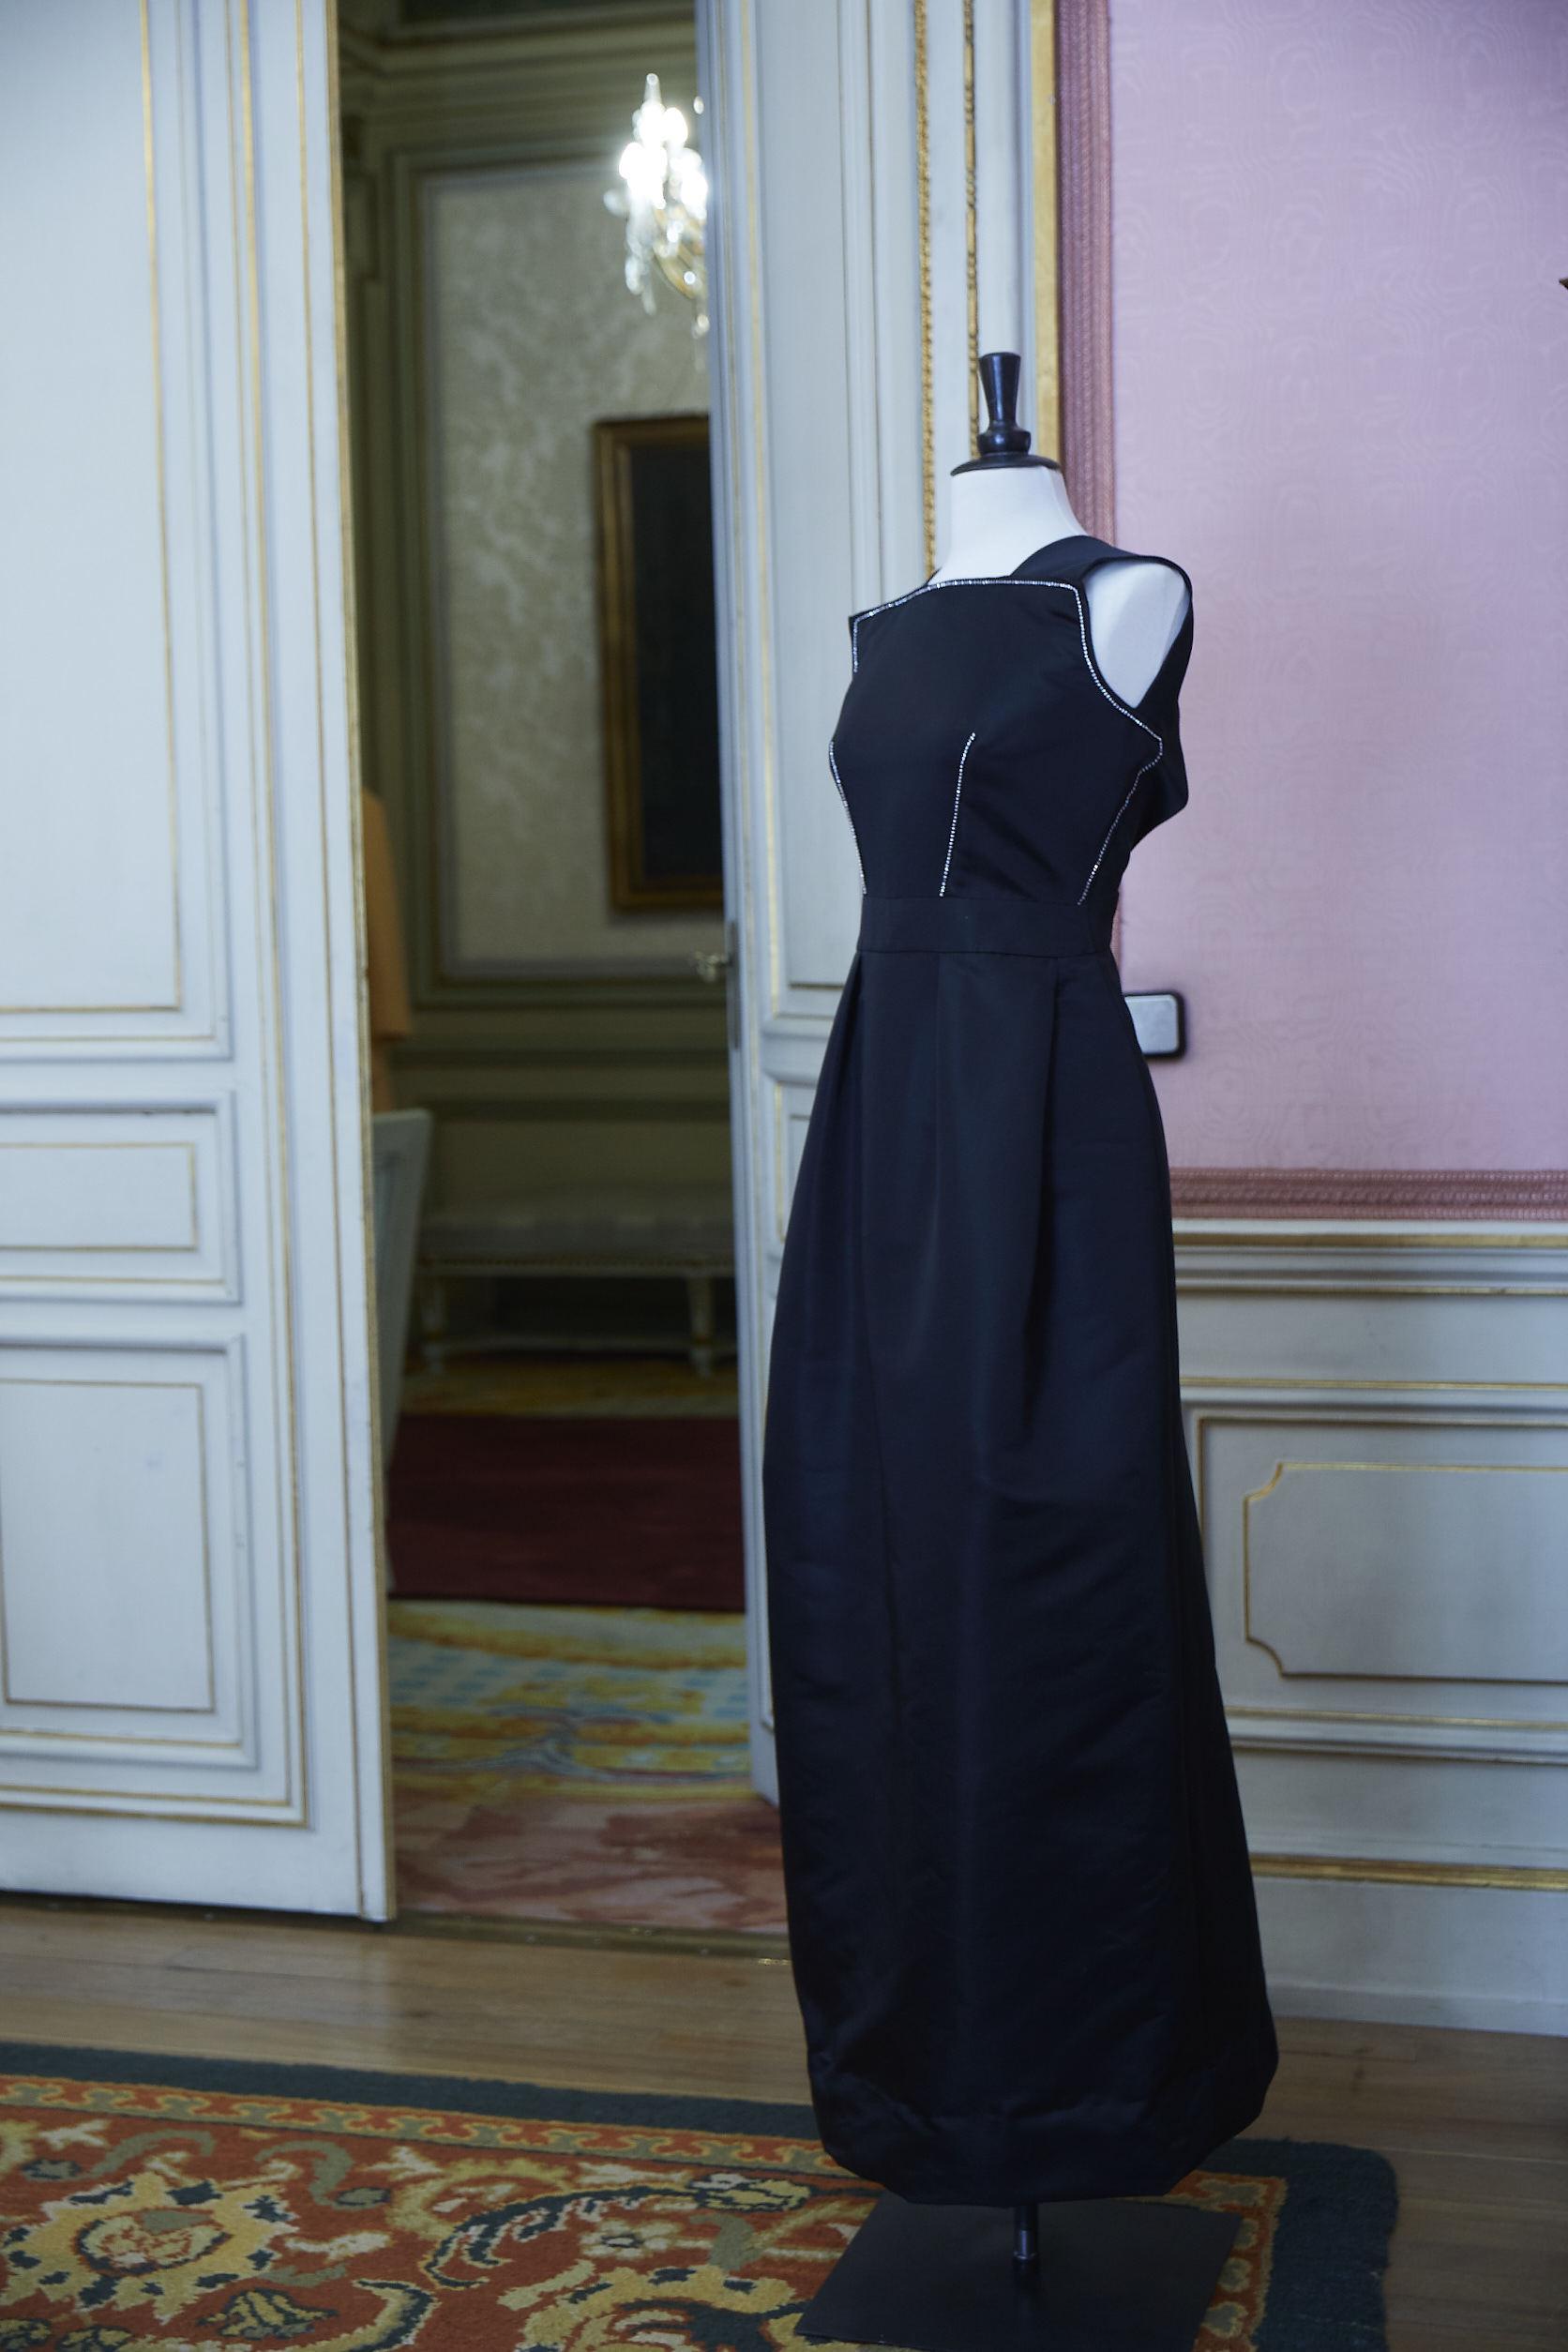 Vestido negro de Roberto Verino.